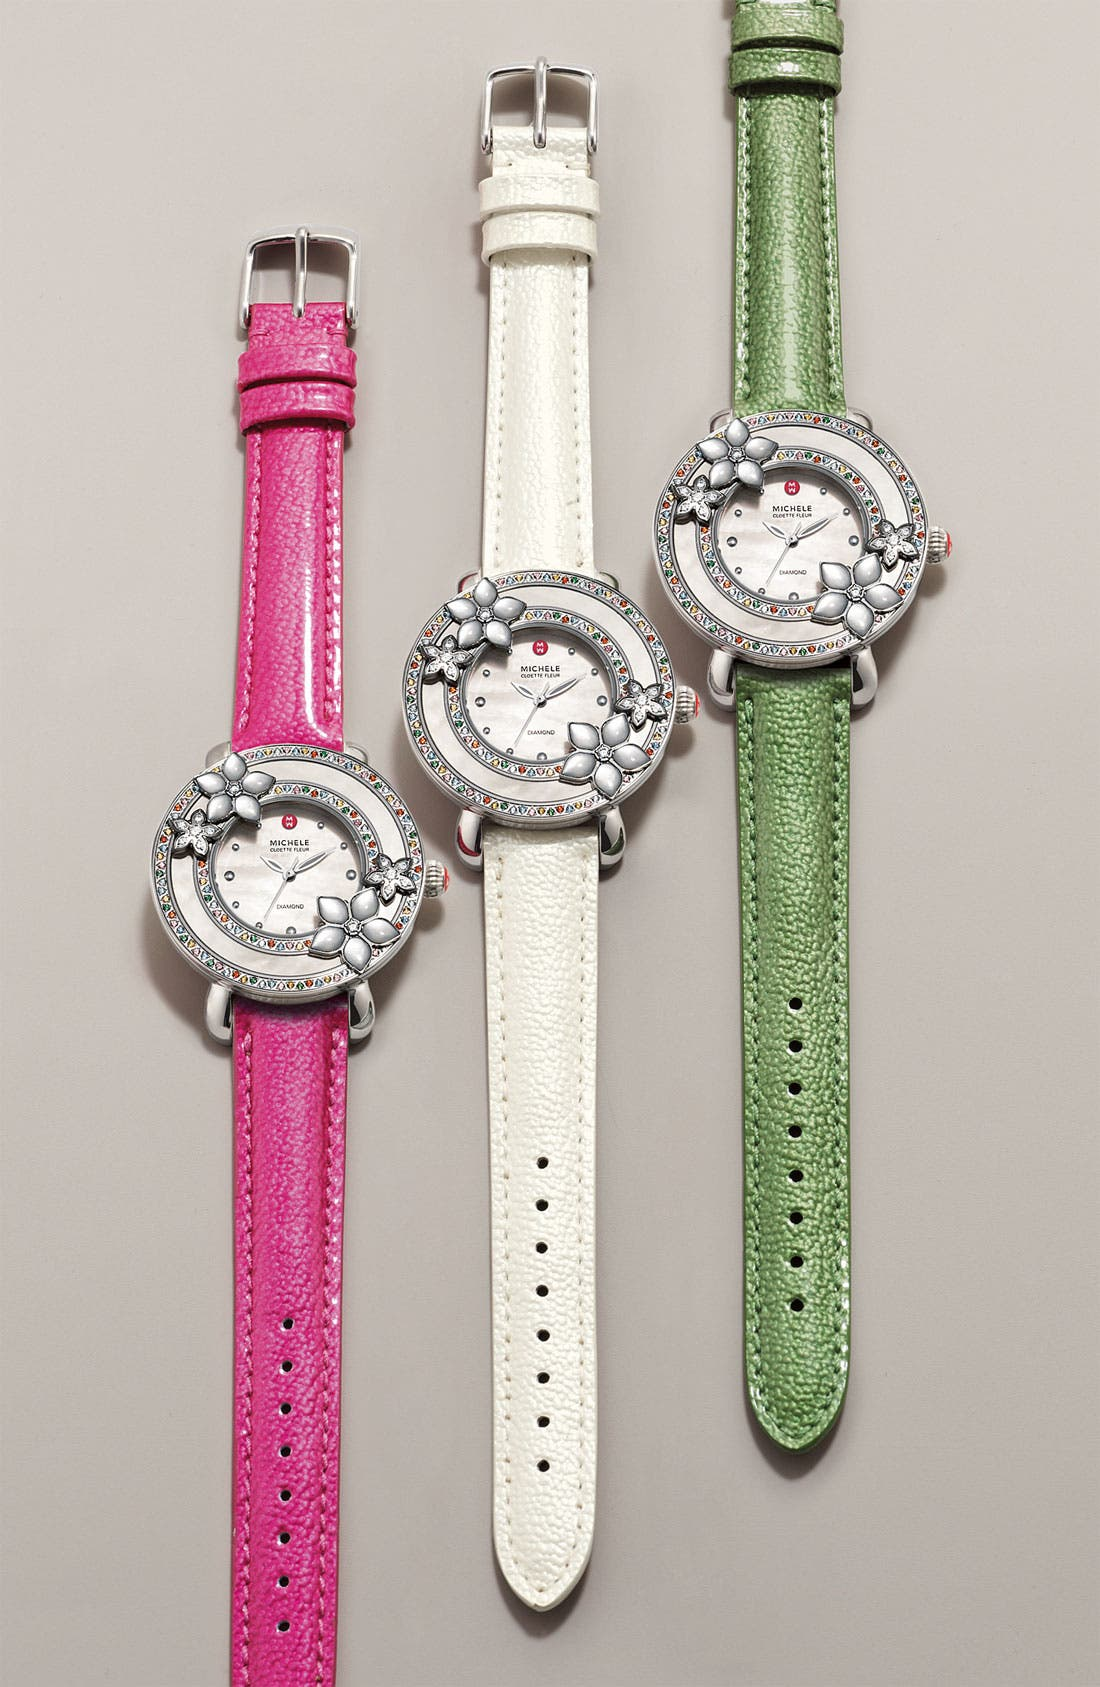 Main Image - MICHELE 'Cloette Fleur' Customizable Watch